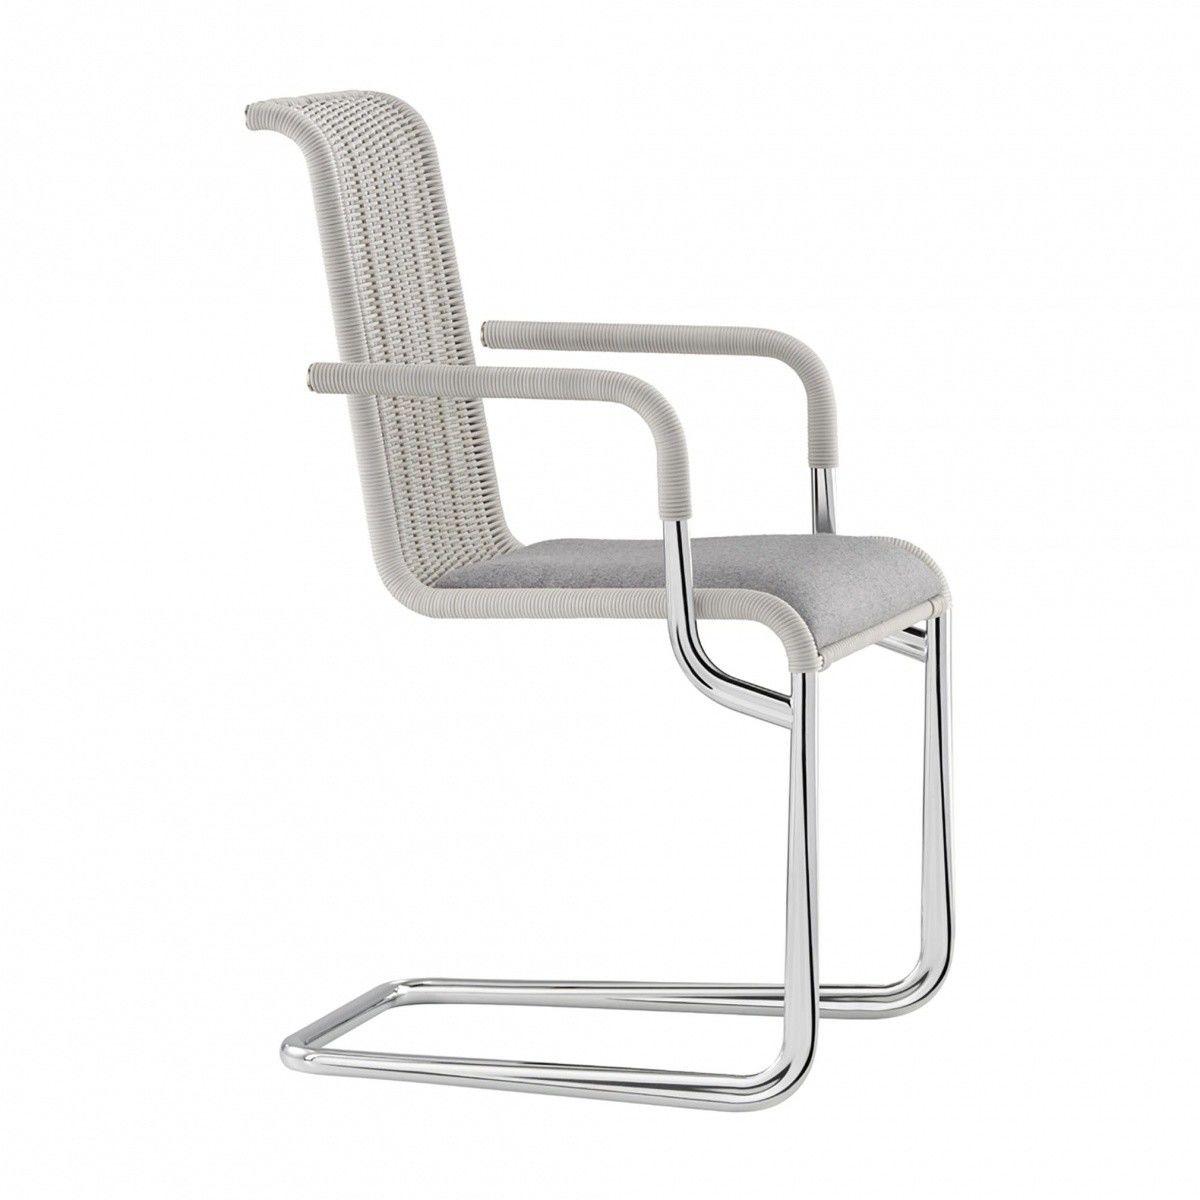 tecta d21i freischwinger armlehnstuhl tecta. Black Bedroom Furniture Sets. Home Design Ideas